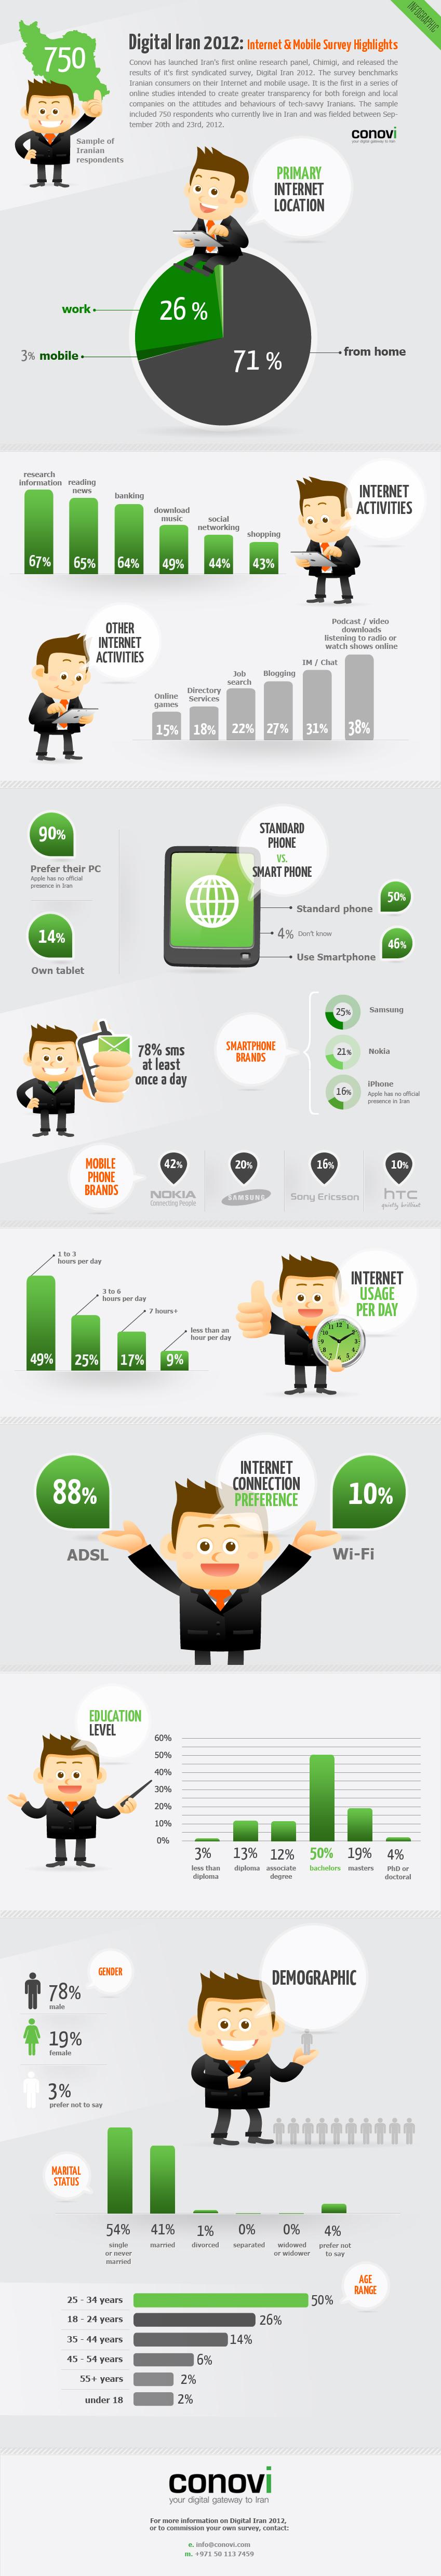 Iran Internet Usage-Infographic